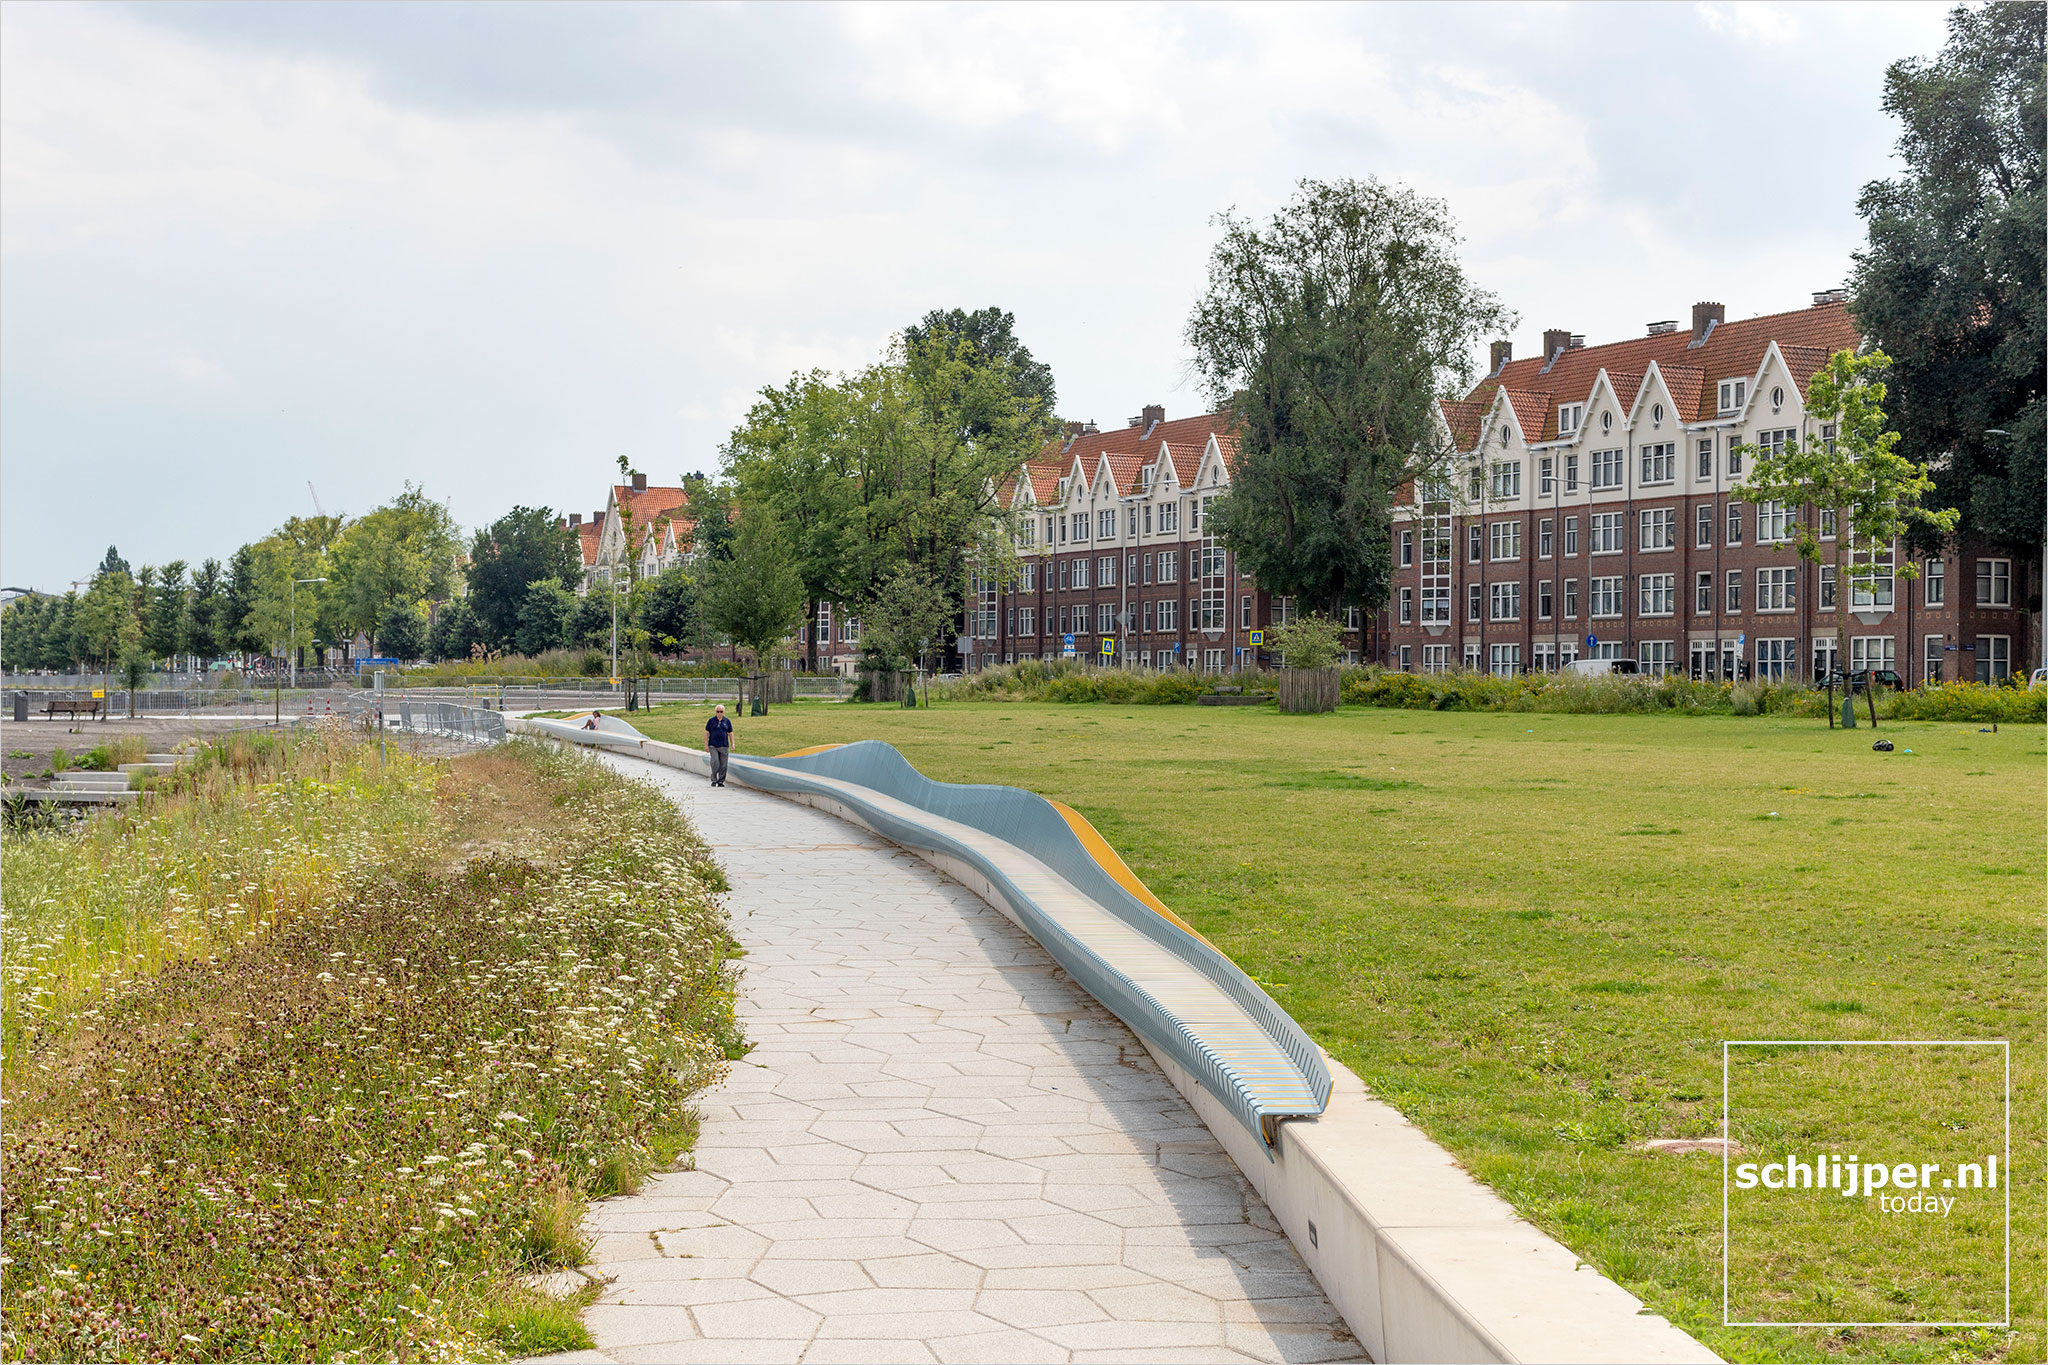 The Netherlands, Amsterdam, 5 augustus 2021